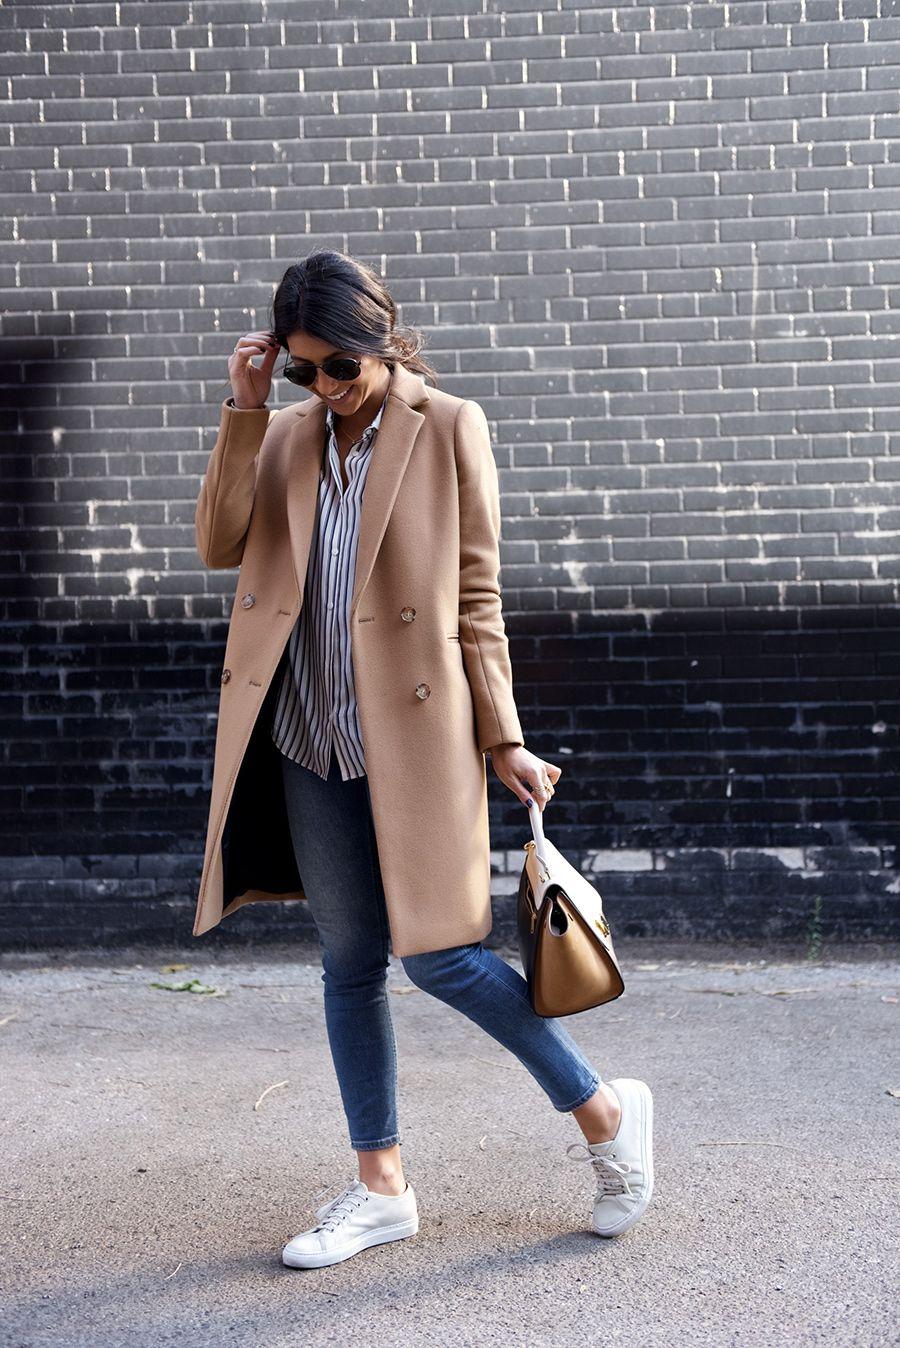 ideas con abrigo camel camel coat camel and jeans and sneakers